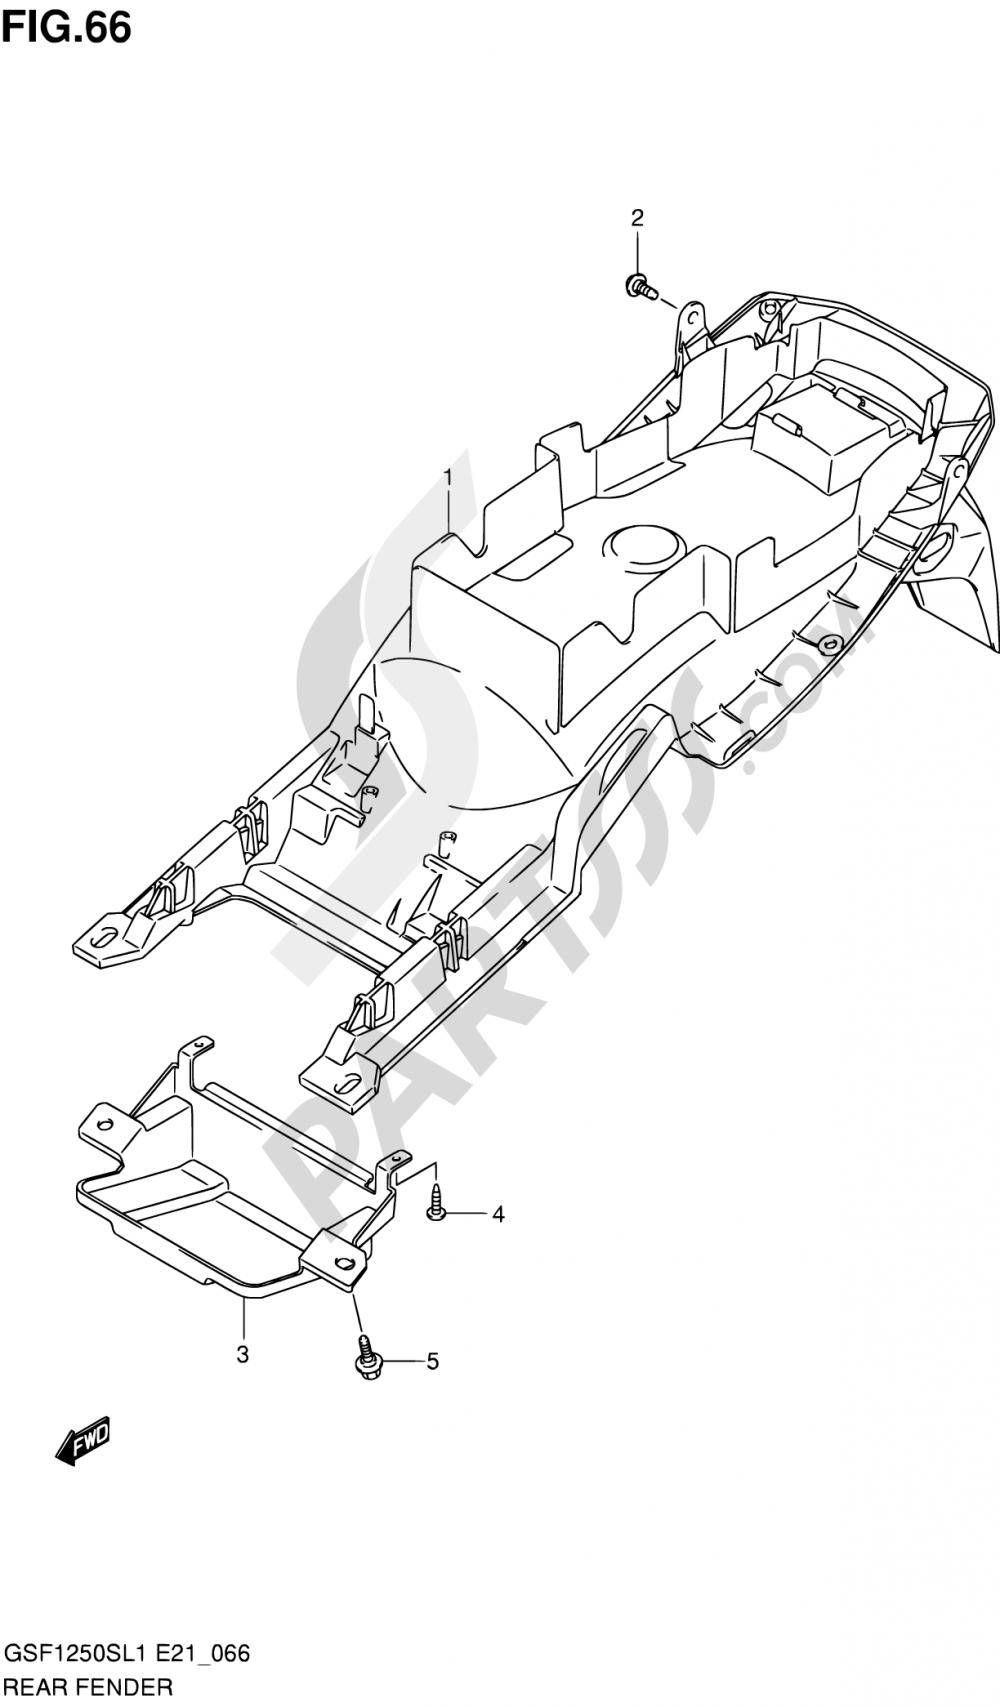 66 - REAR FENDER (GSF1250SL1 E21) Suzuki BANDIT GSF1250 2011